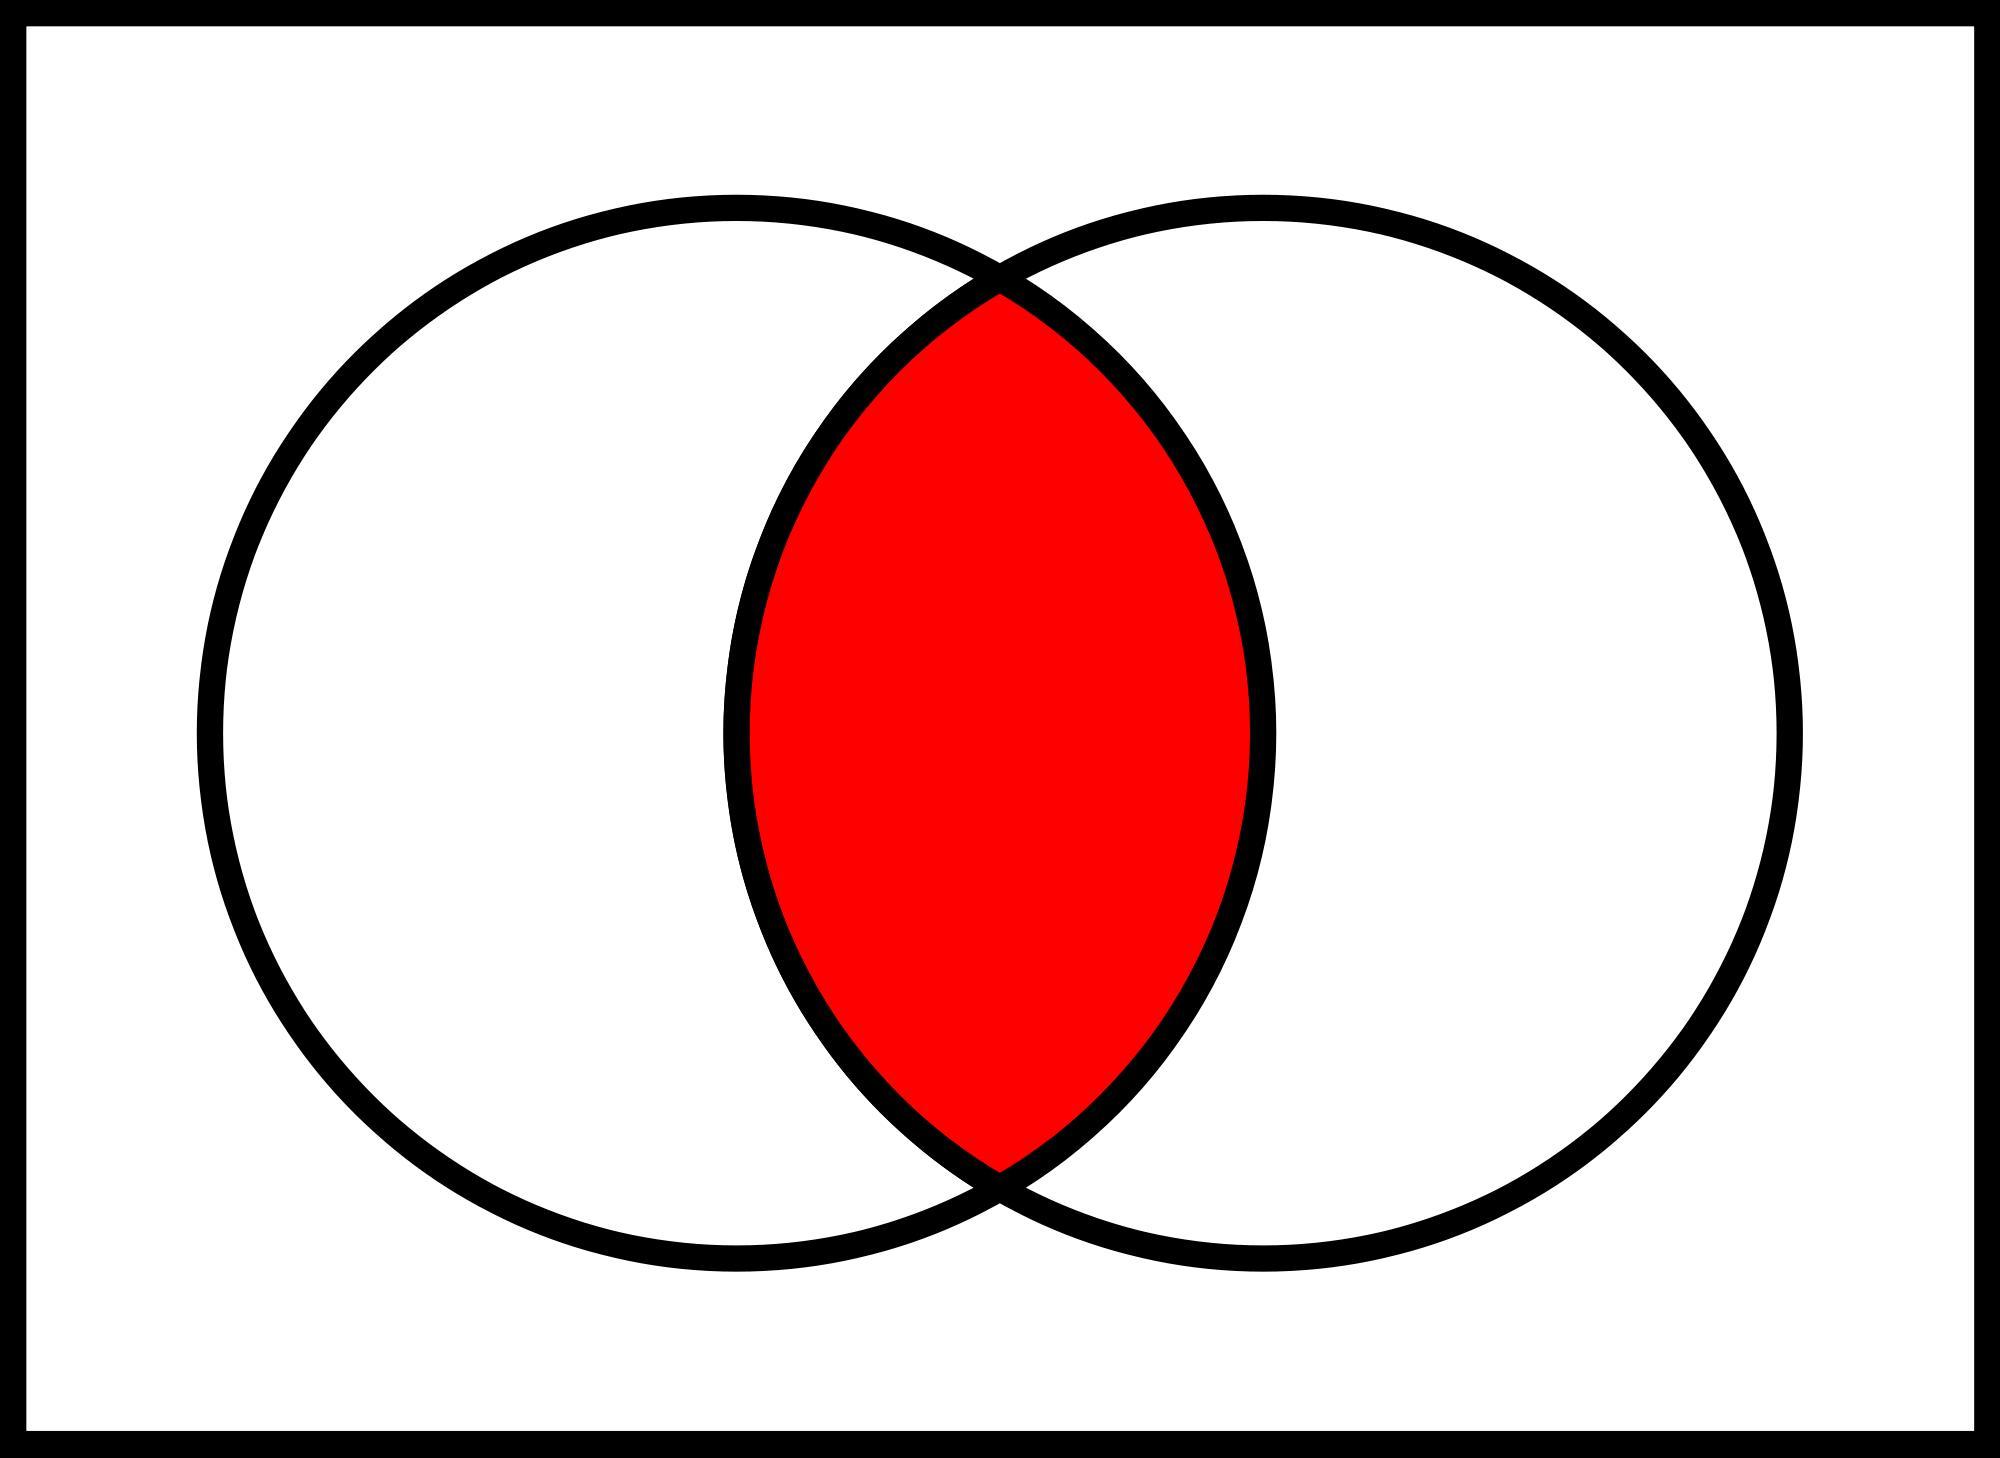 Wiskunde-werkbladen Venn-diagram Redactiesommen 1